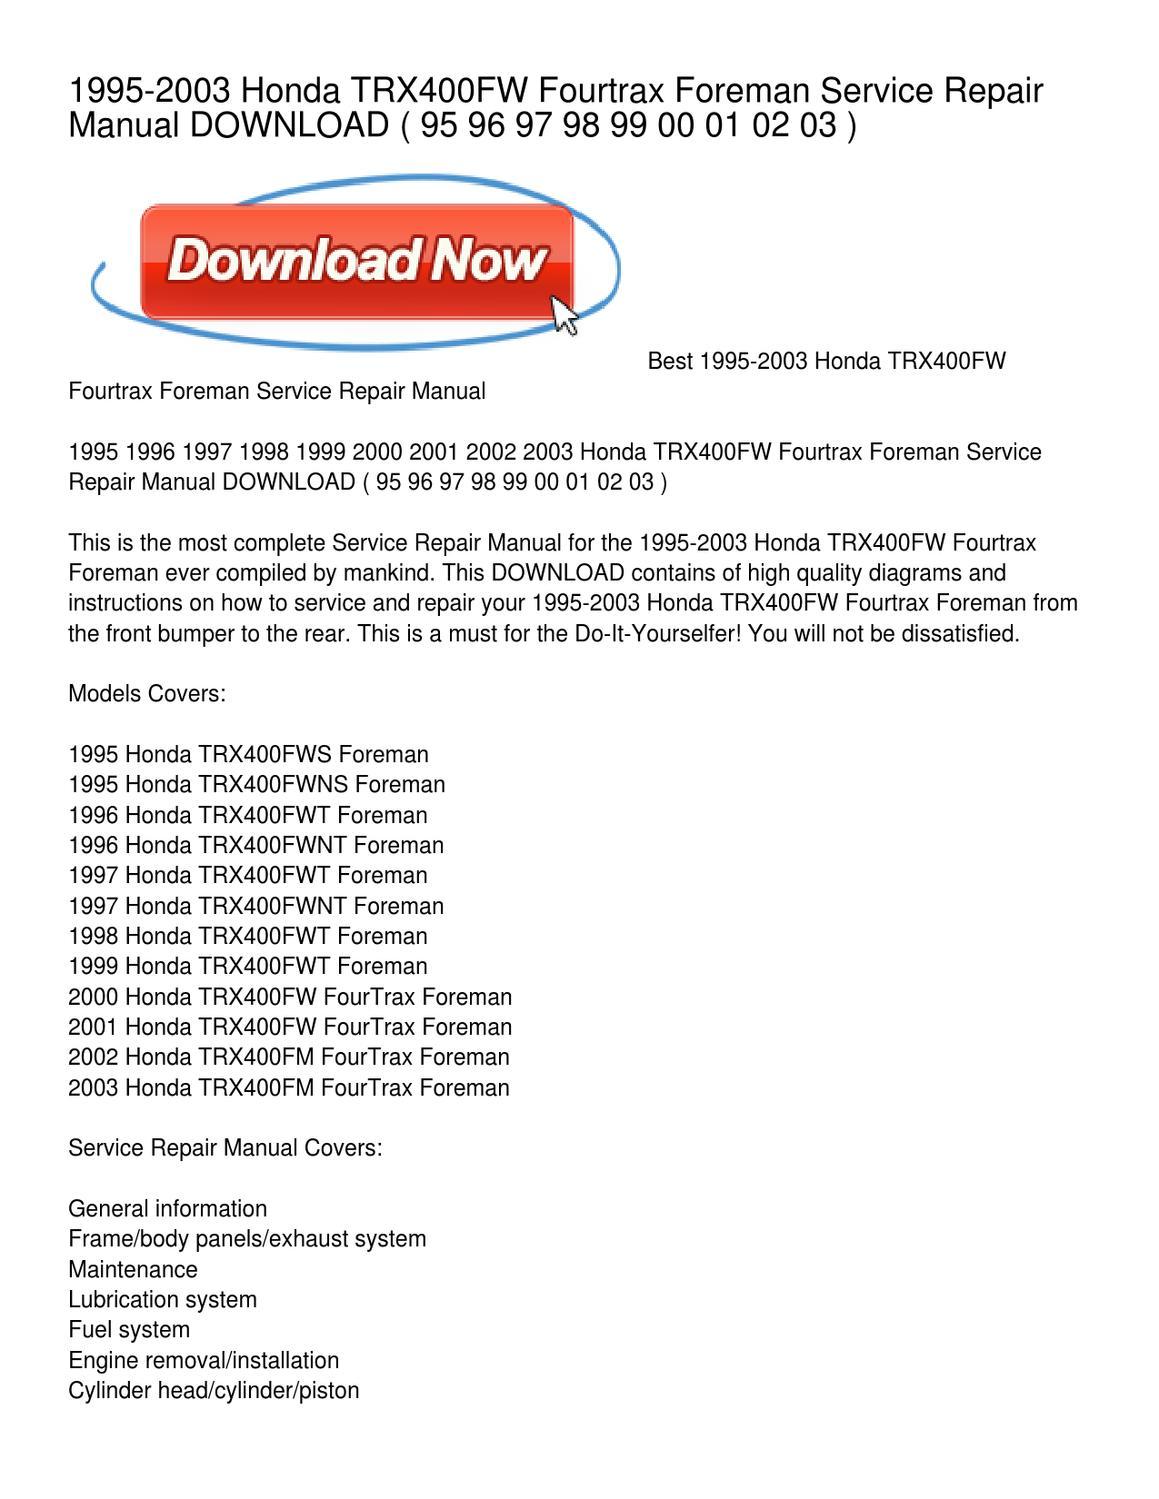 1995 2003 Honda Trx400fw Fourtrax Foreman Service Repair Manual 00 Wiring Diagram Download By Carlos Mccullough Issuu